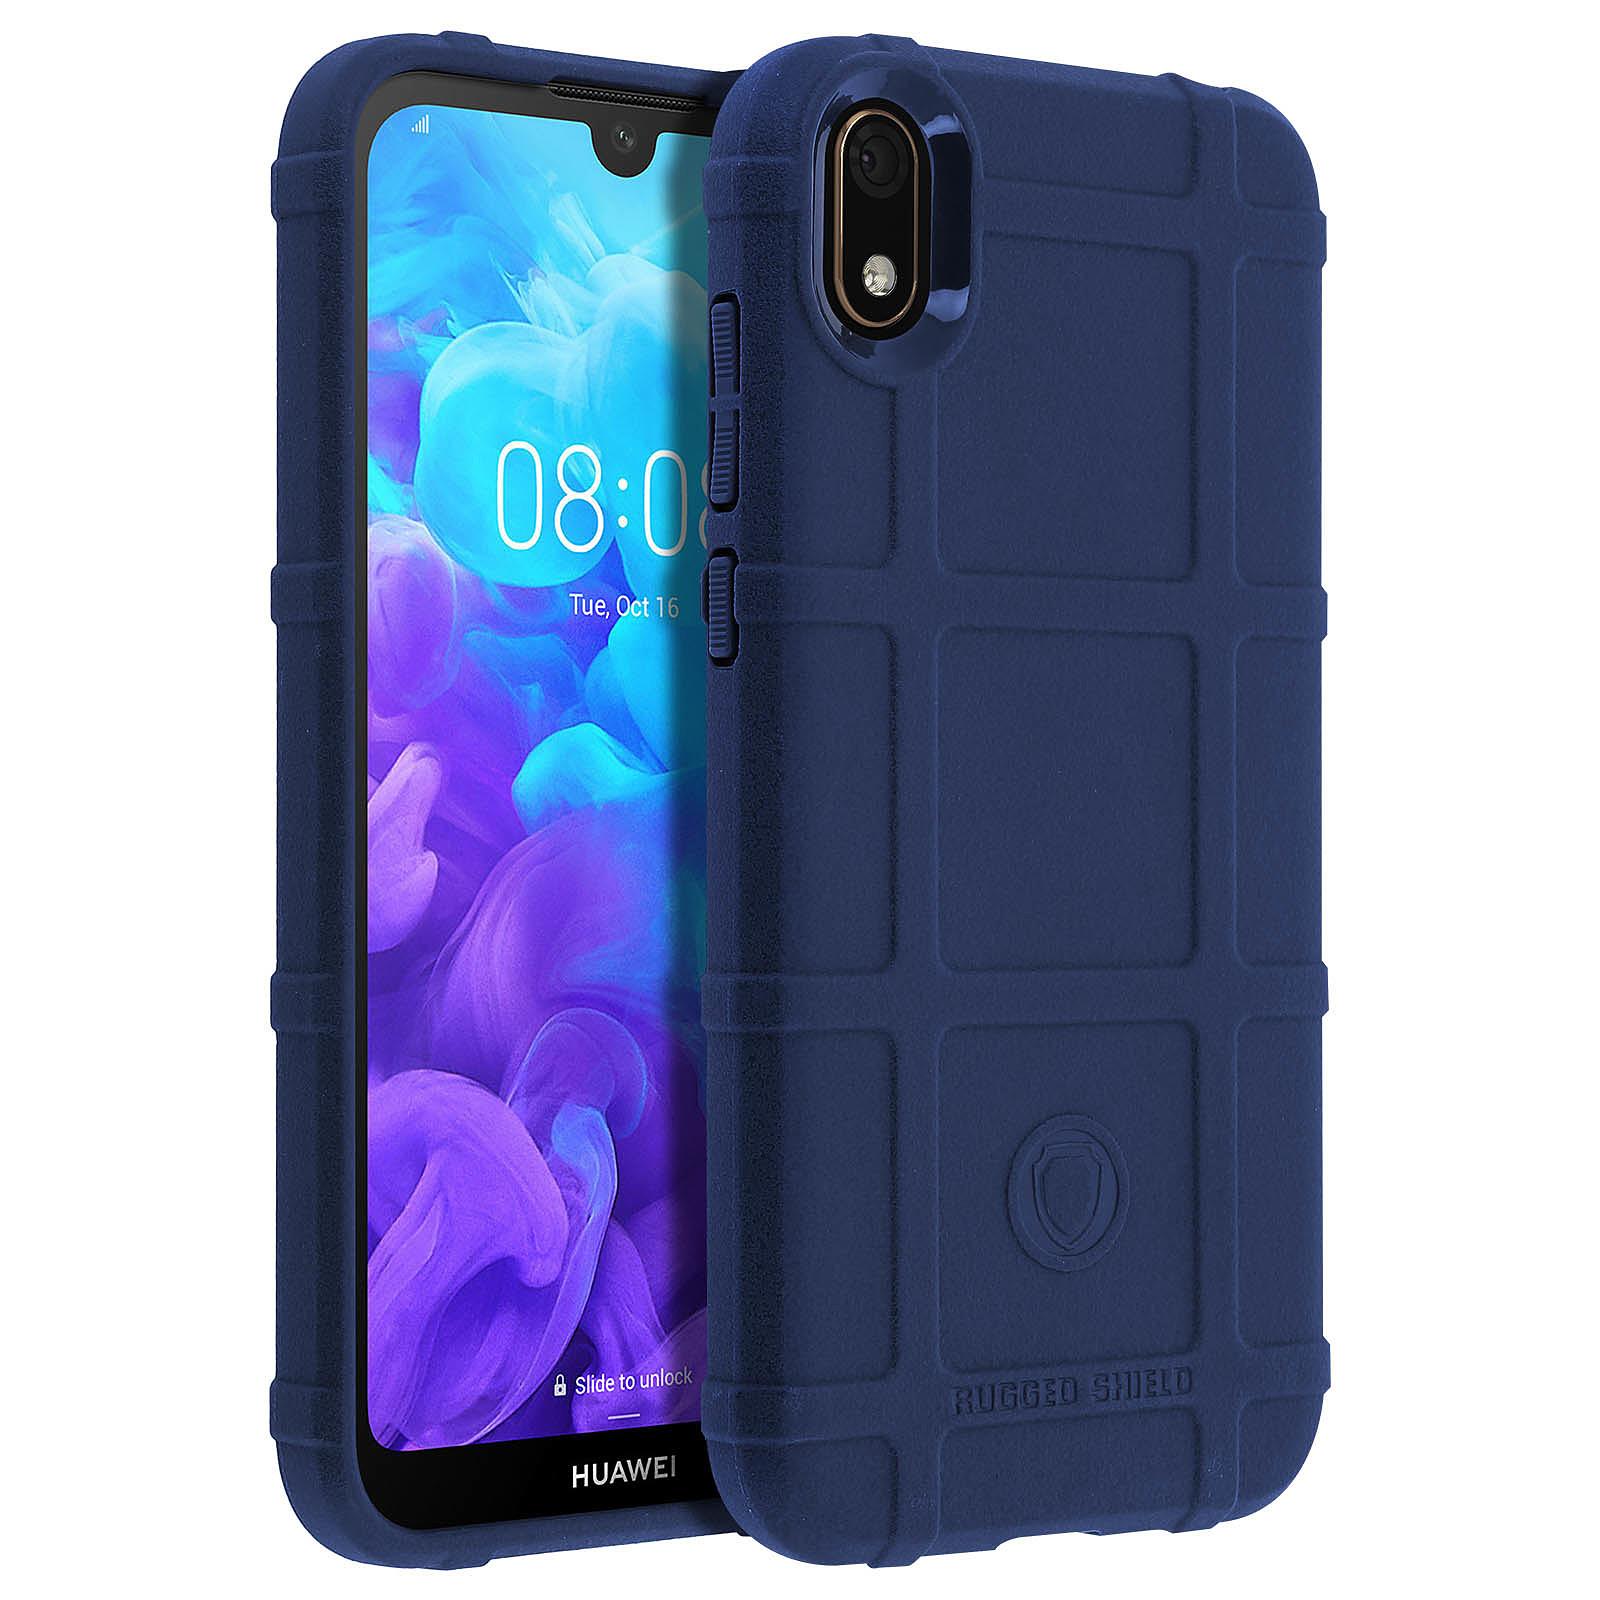 Avizar Coque Bleu Nuit pour Huawei Y5 2019 , Honor 8S